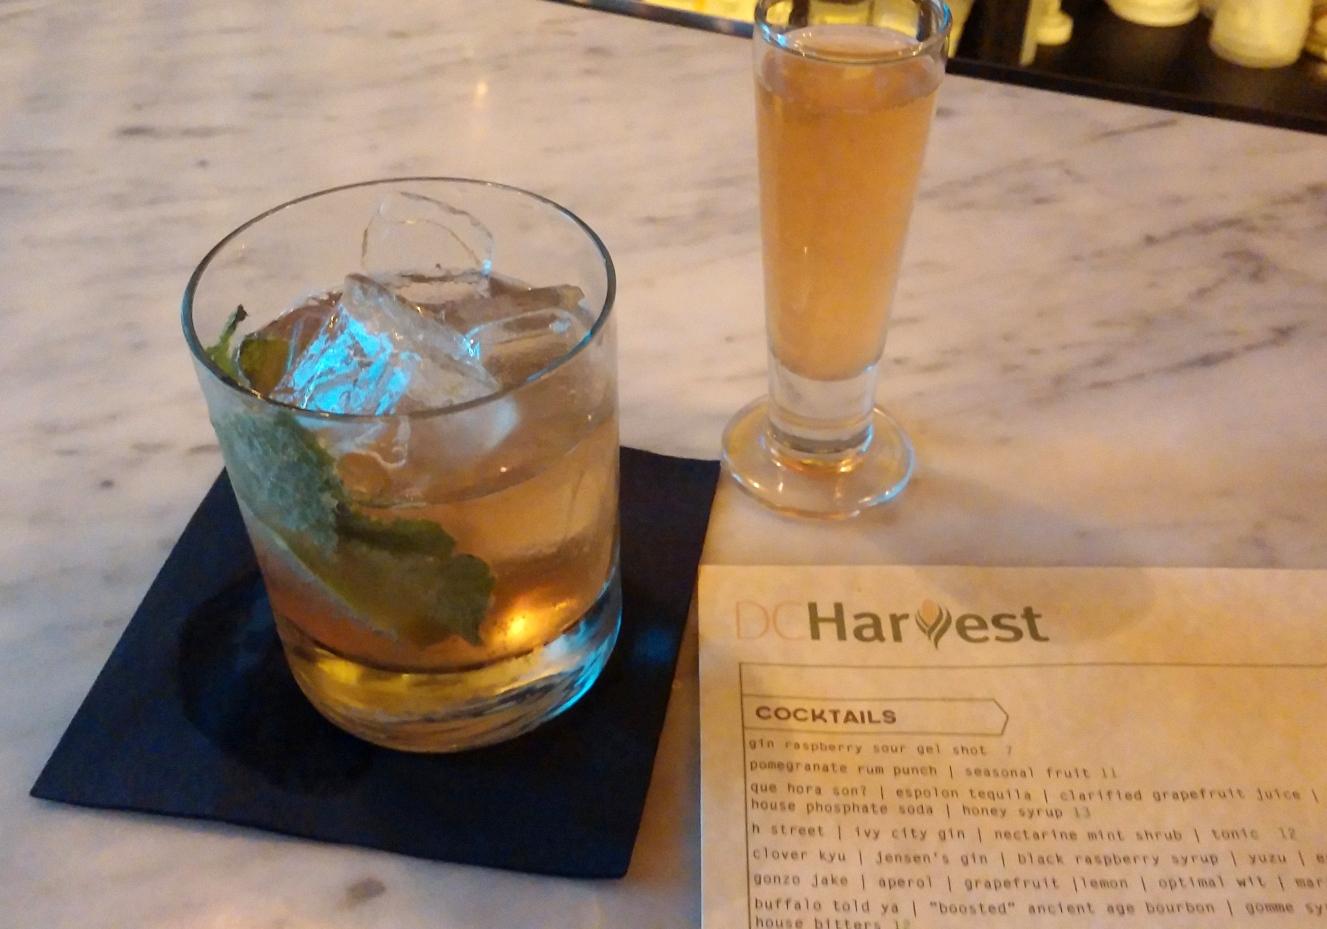 DC Harvest's Under the Radar, Inventive Cocktail Program